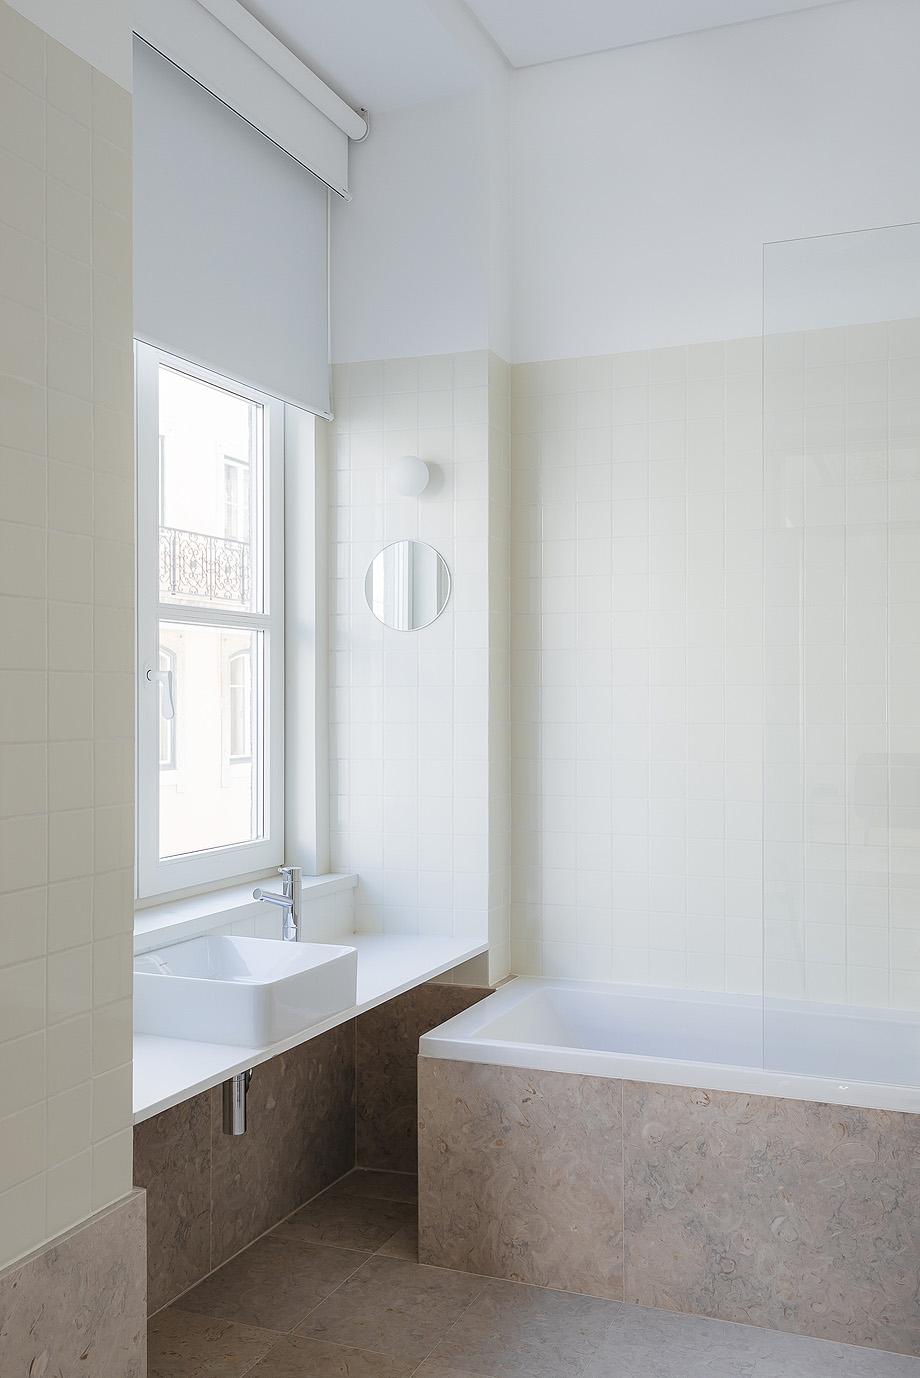 apartamentos pombalinos de aurora arquitectos - foto do mal o menos (10)